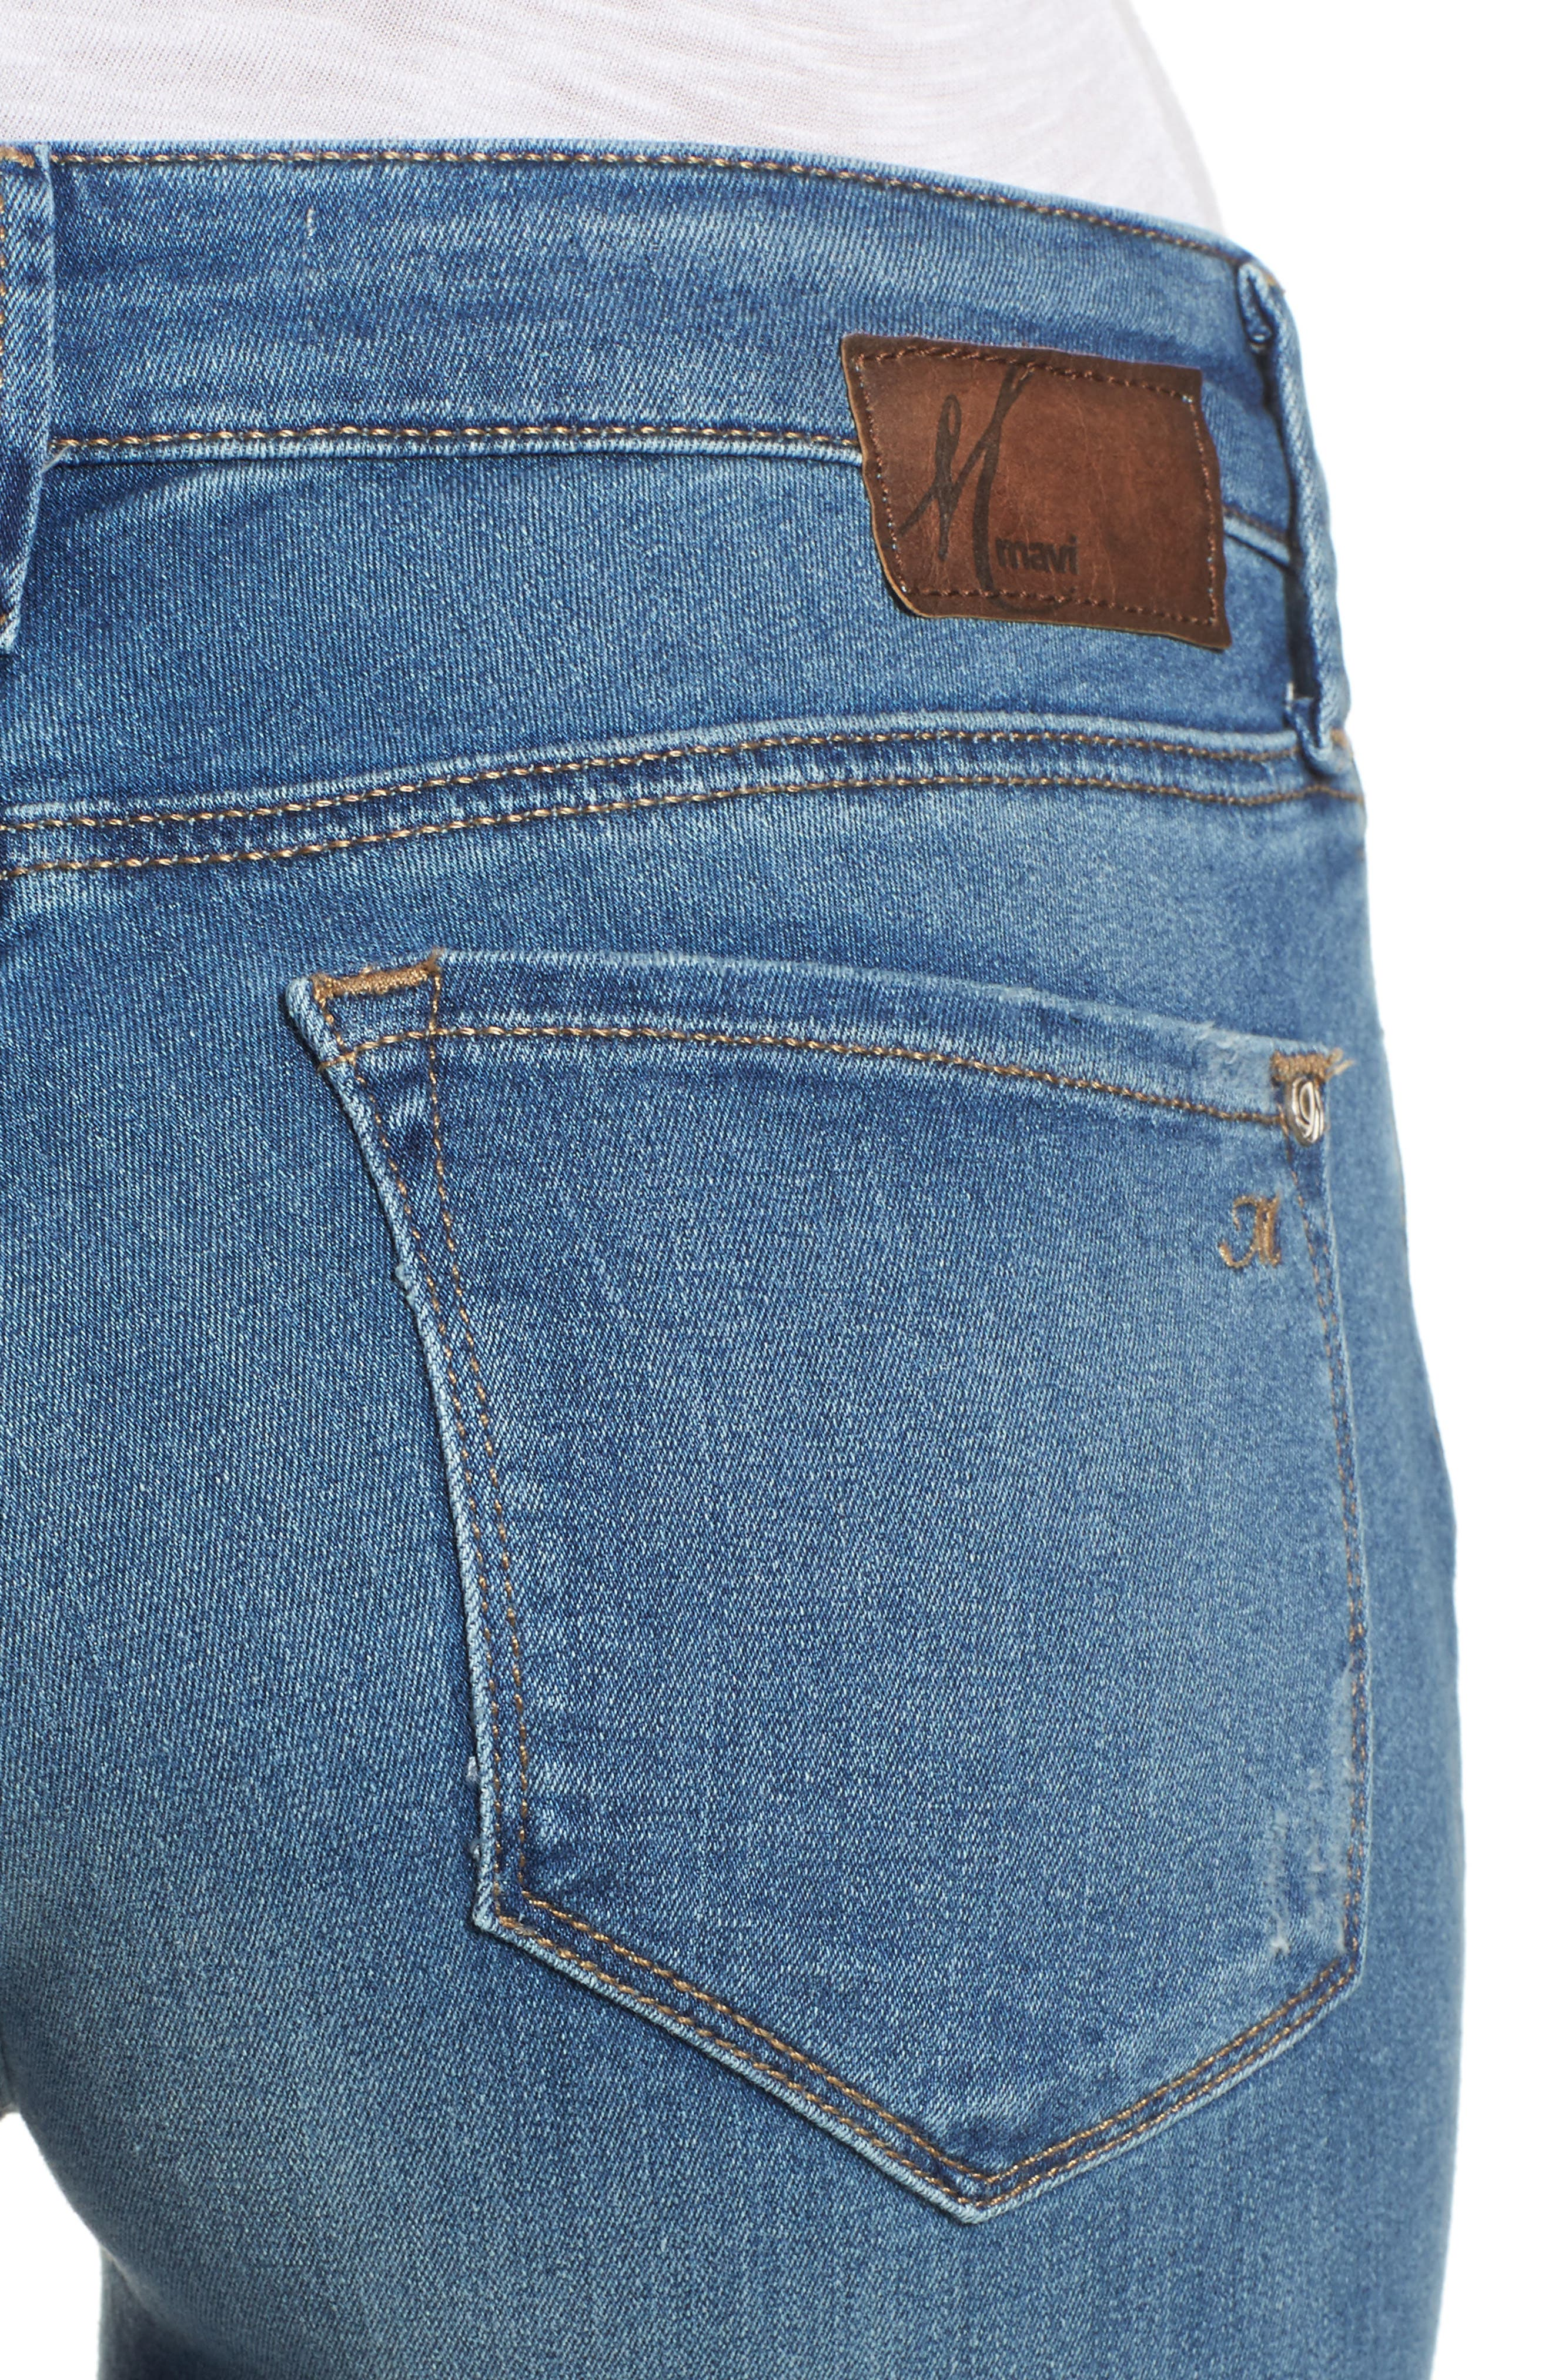 Adriana Stretch Skinny Jeans,                             Alternate thumbnail 4, color,                             420